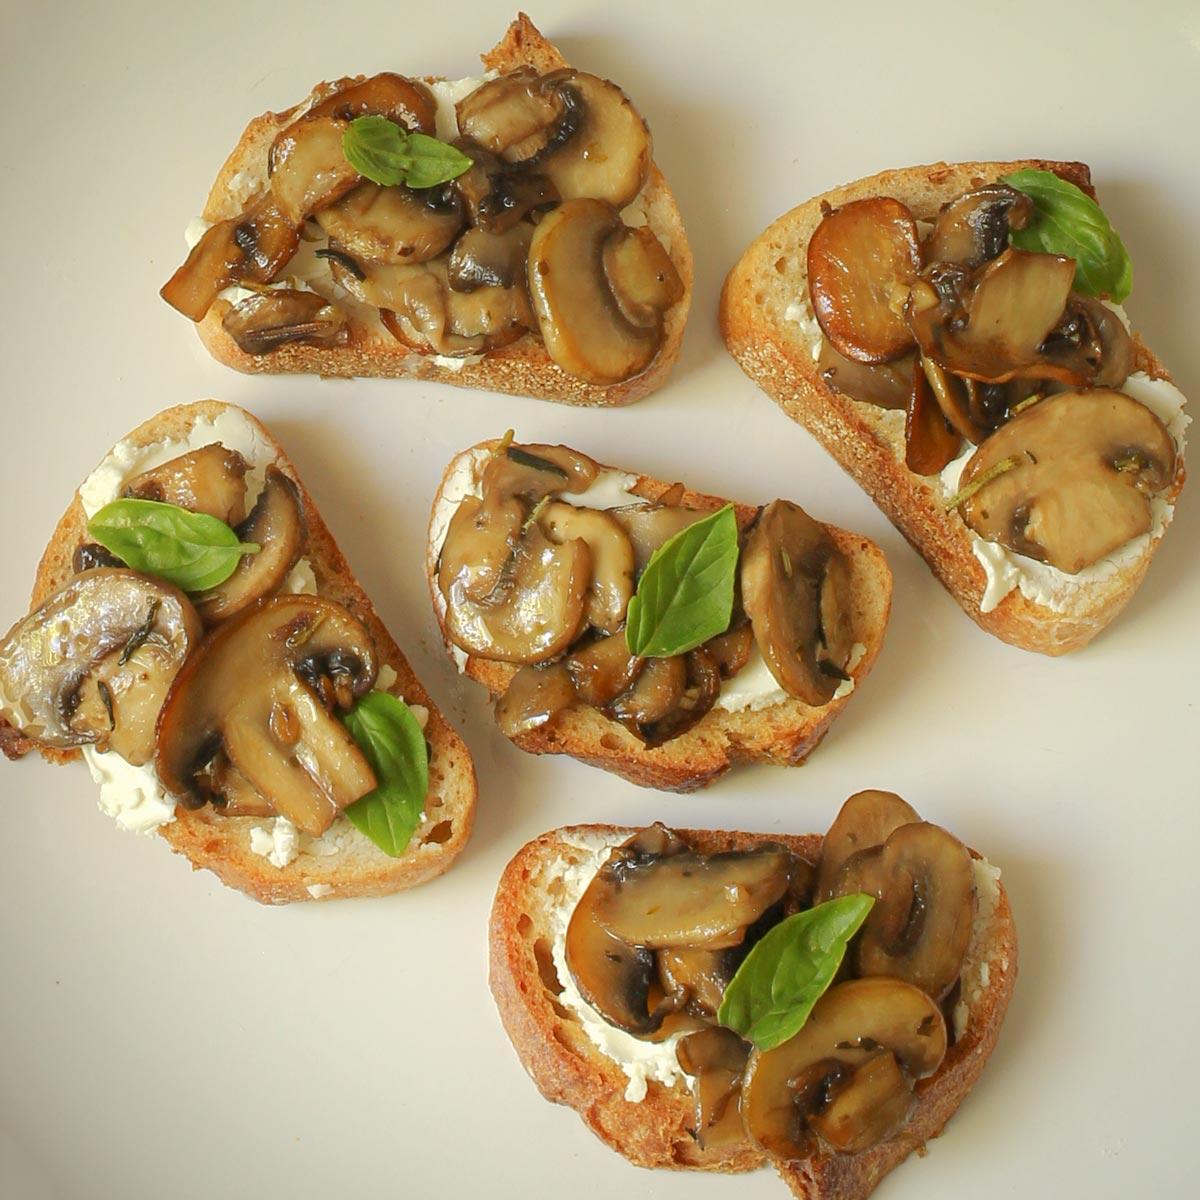 sauteed mushrooms on crostini with goat cheese.